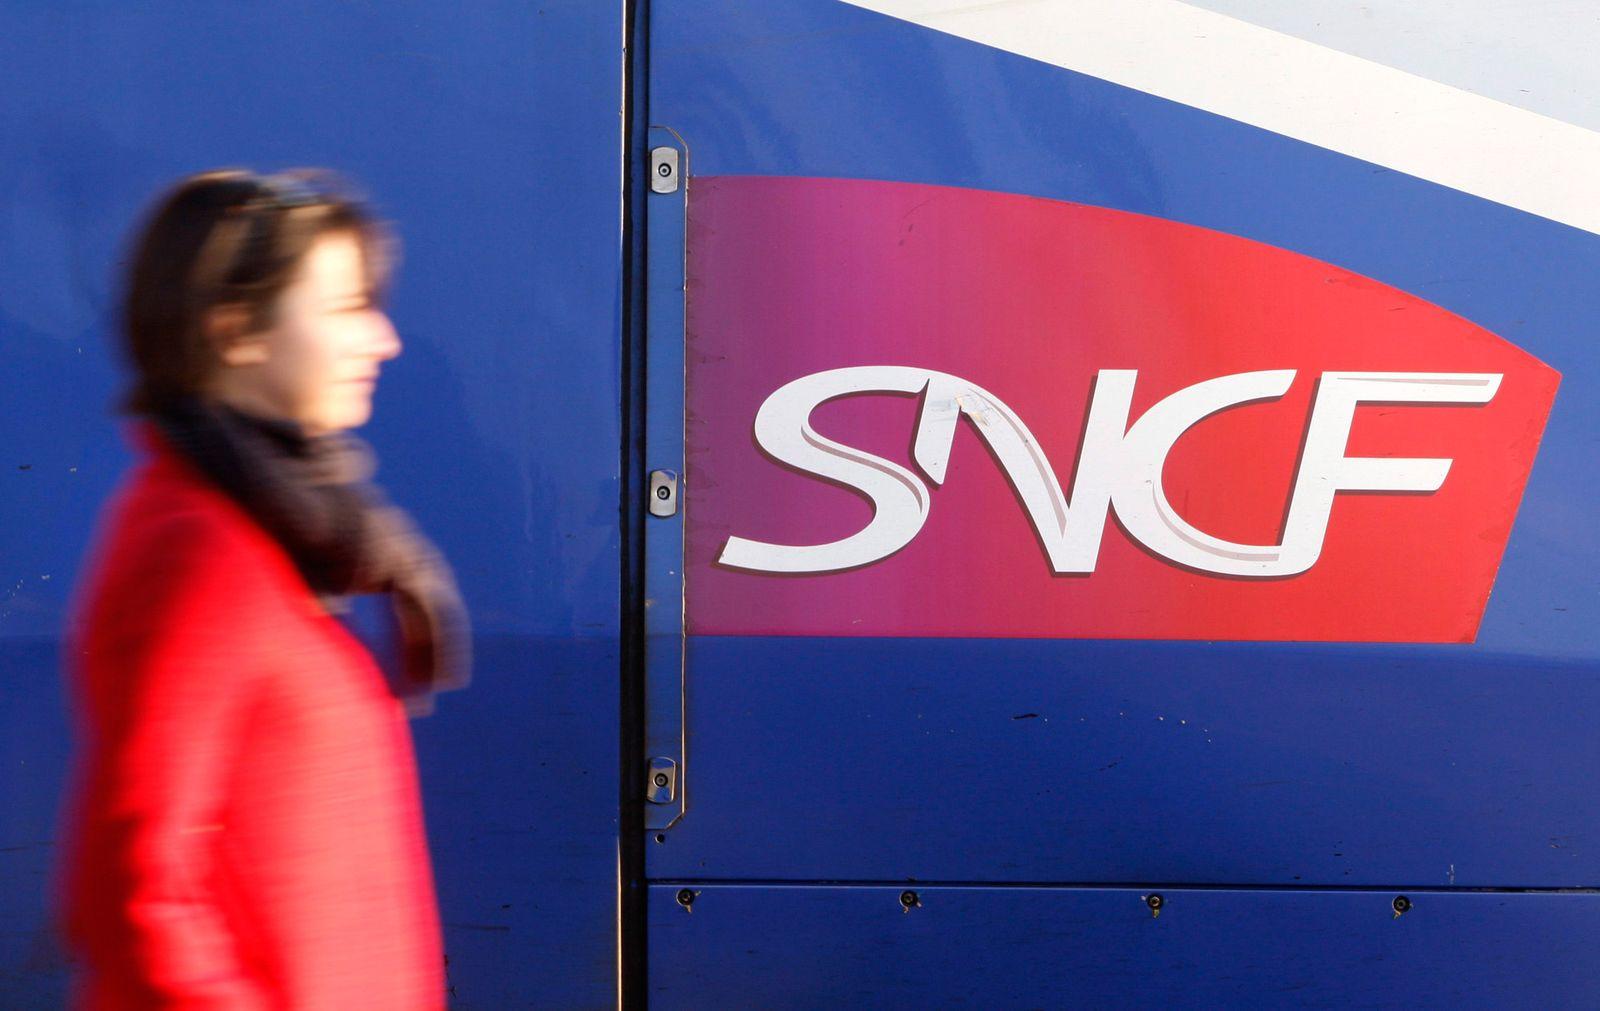 SNCF / Symbol